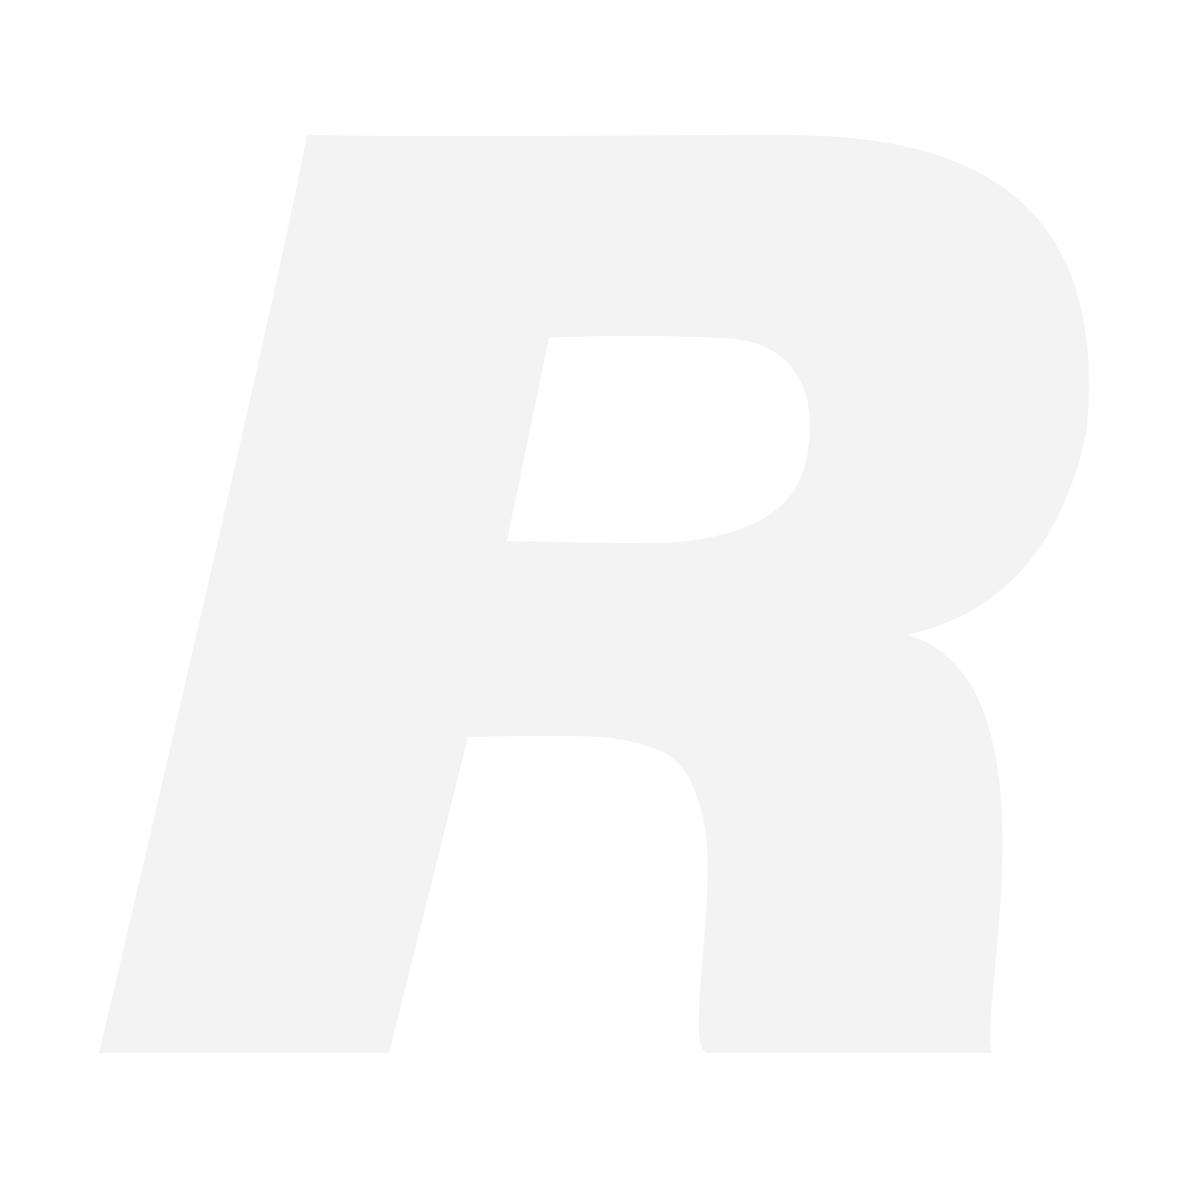 Köp Sony A7 Mark III, byt in din gamla Sony A7R